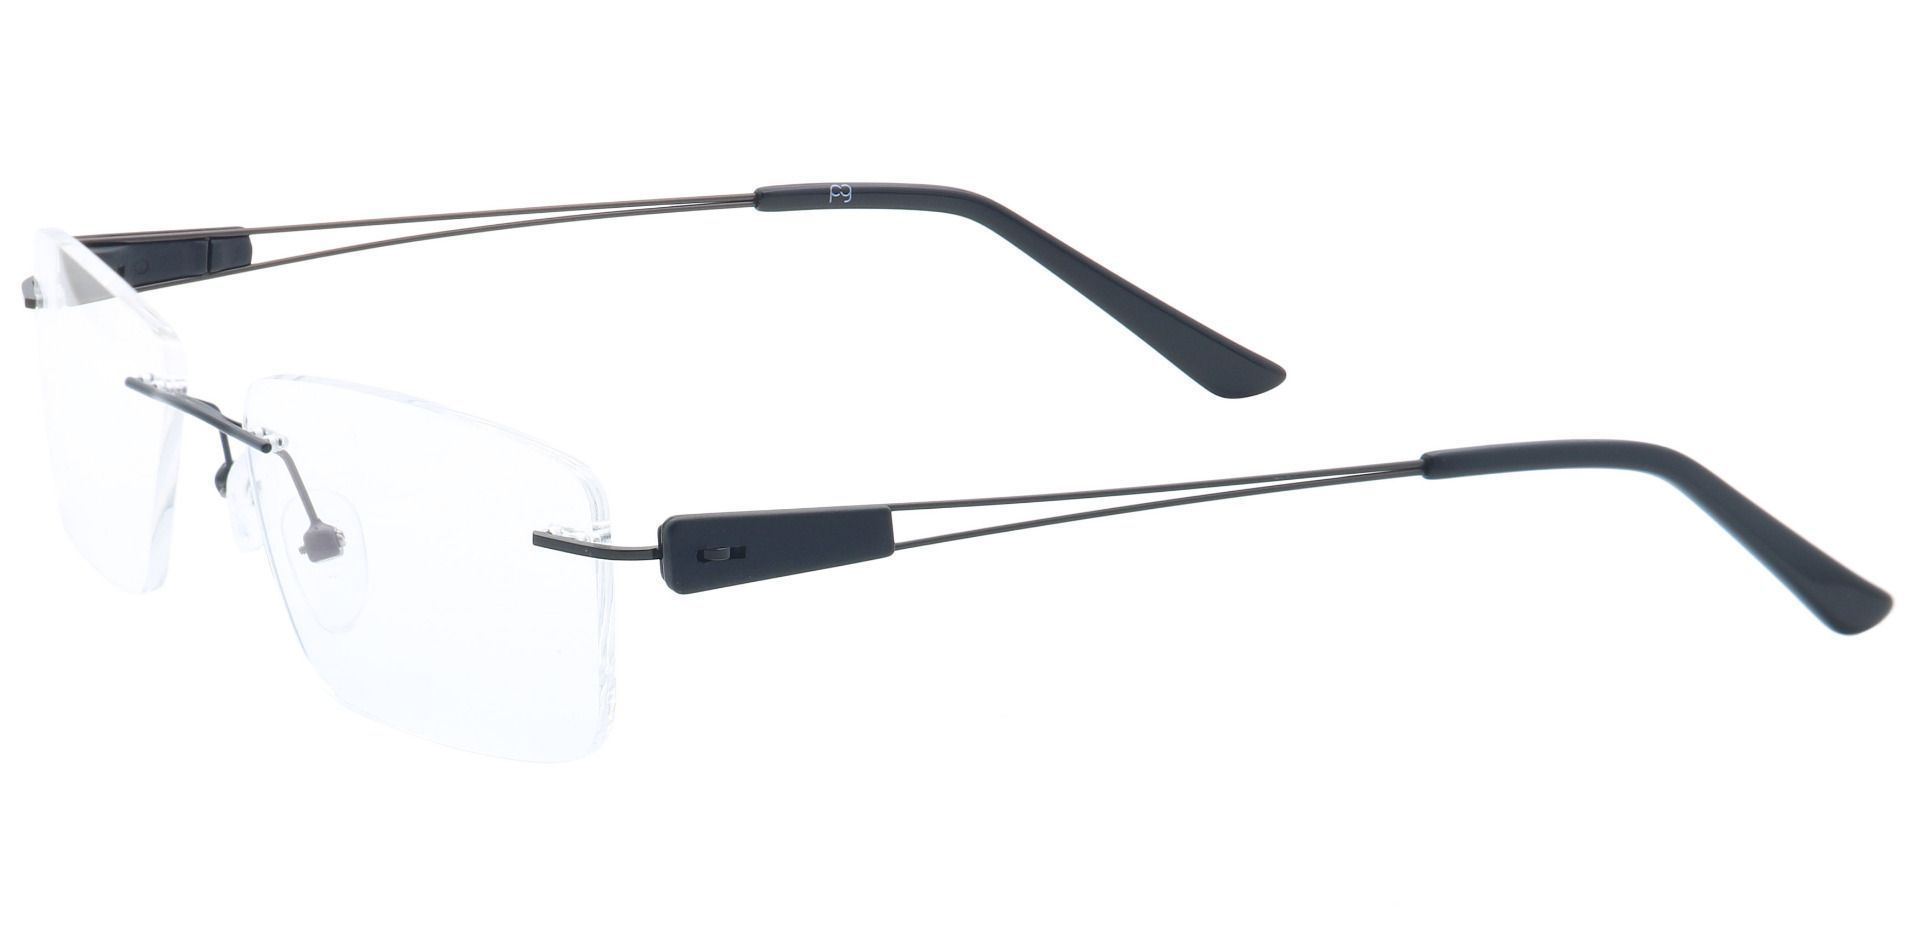 River Rimless Prescription Glasses - Black